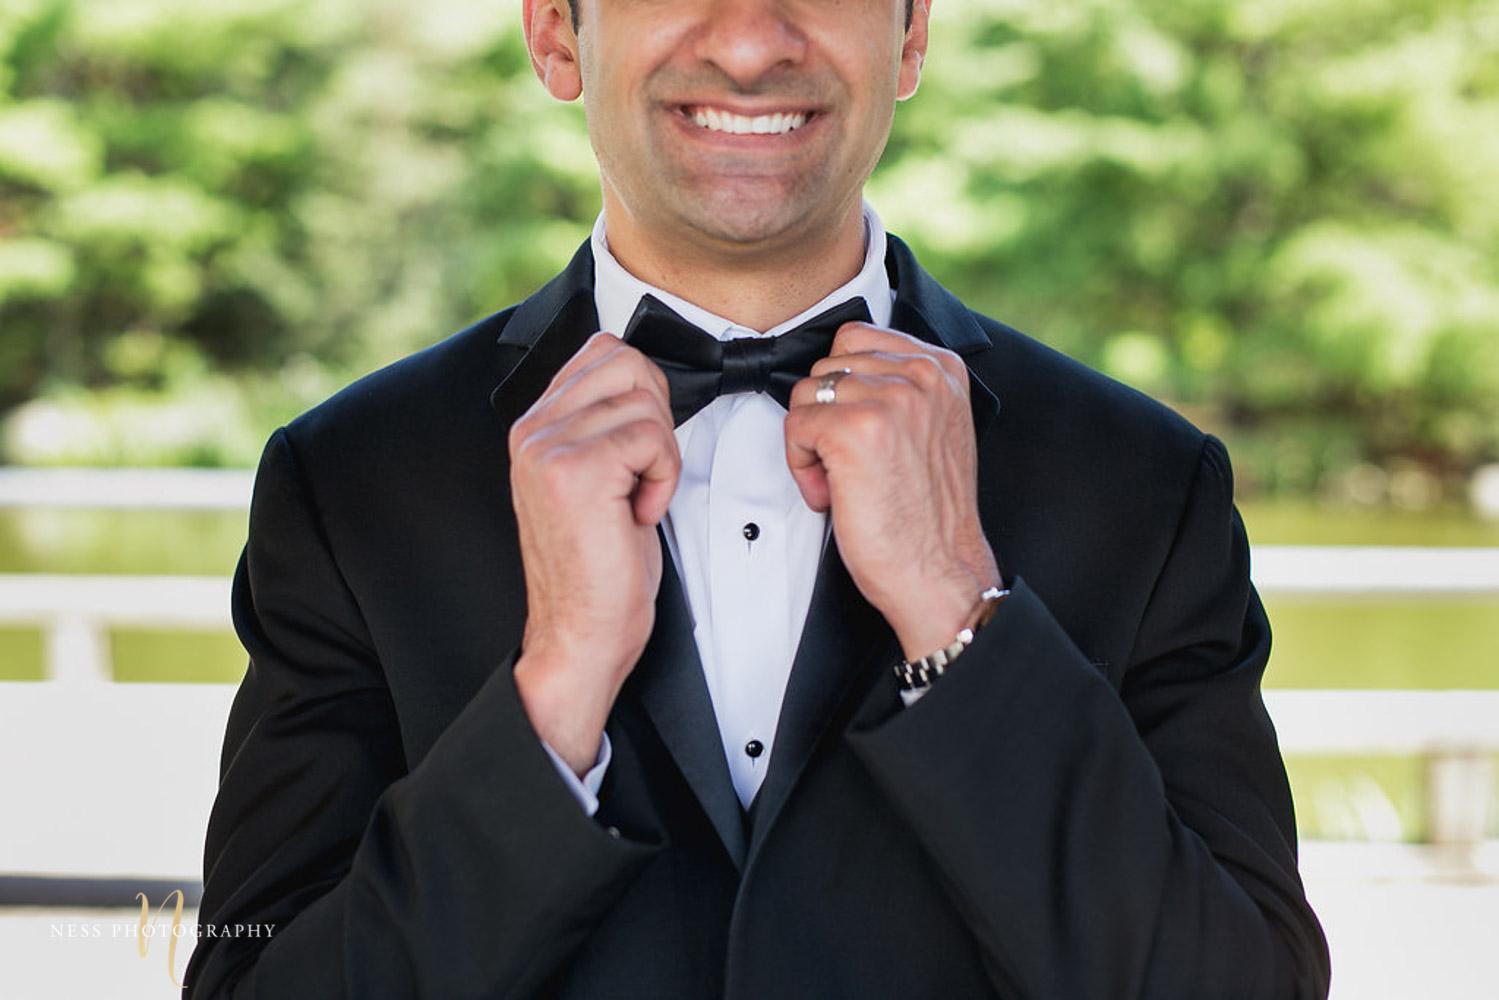 bridal photo of pakistani groom at kariya park fixing his bow tie